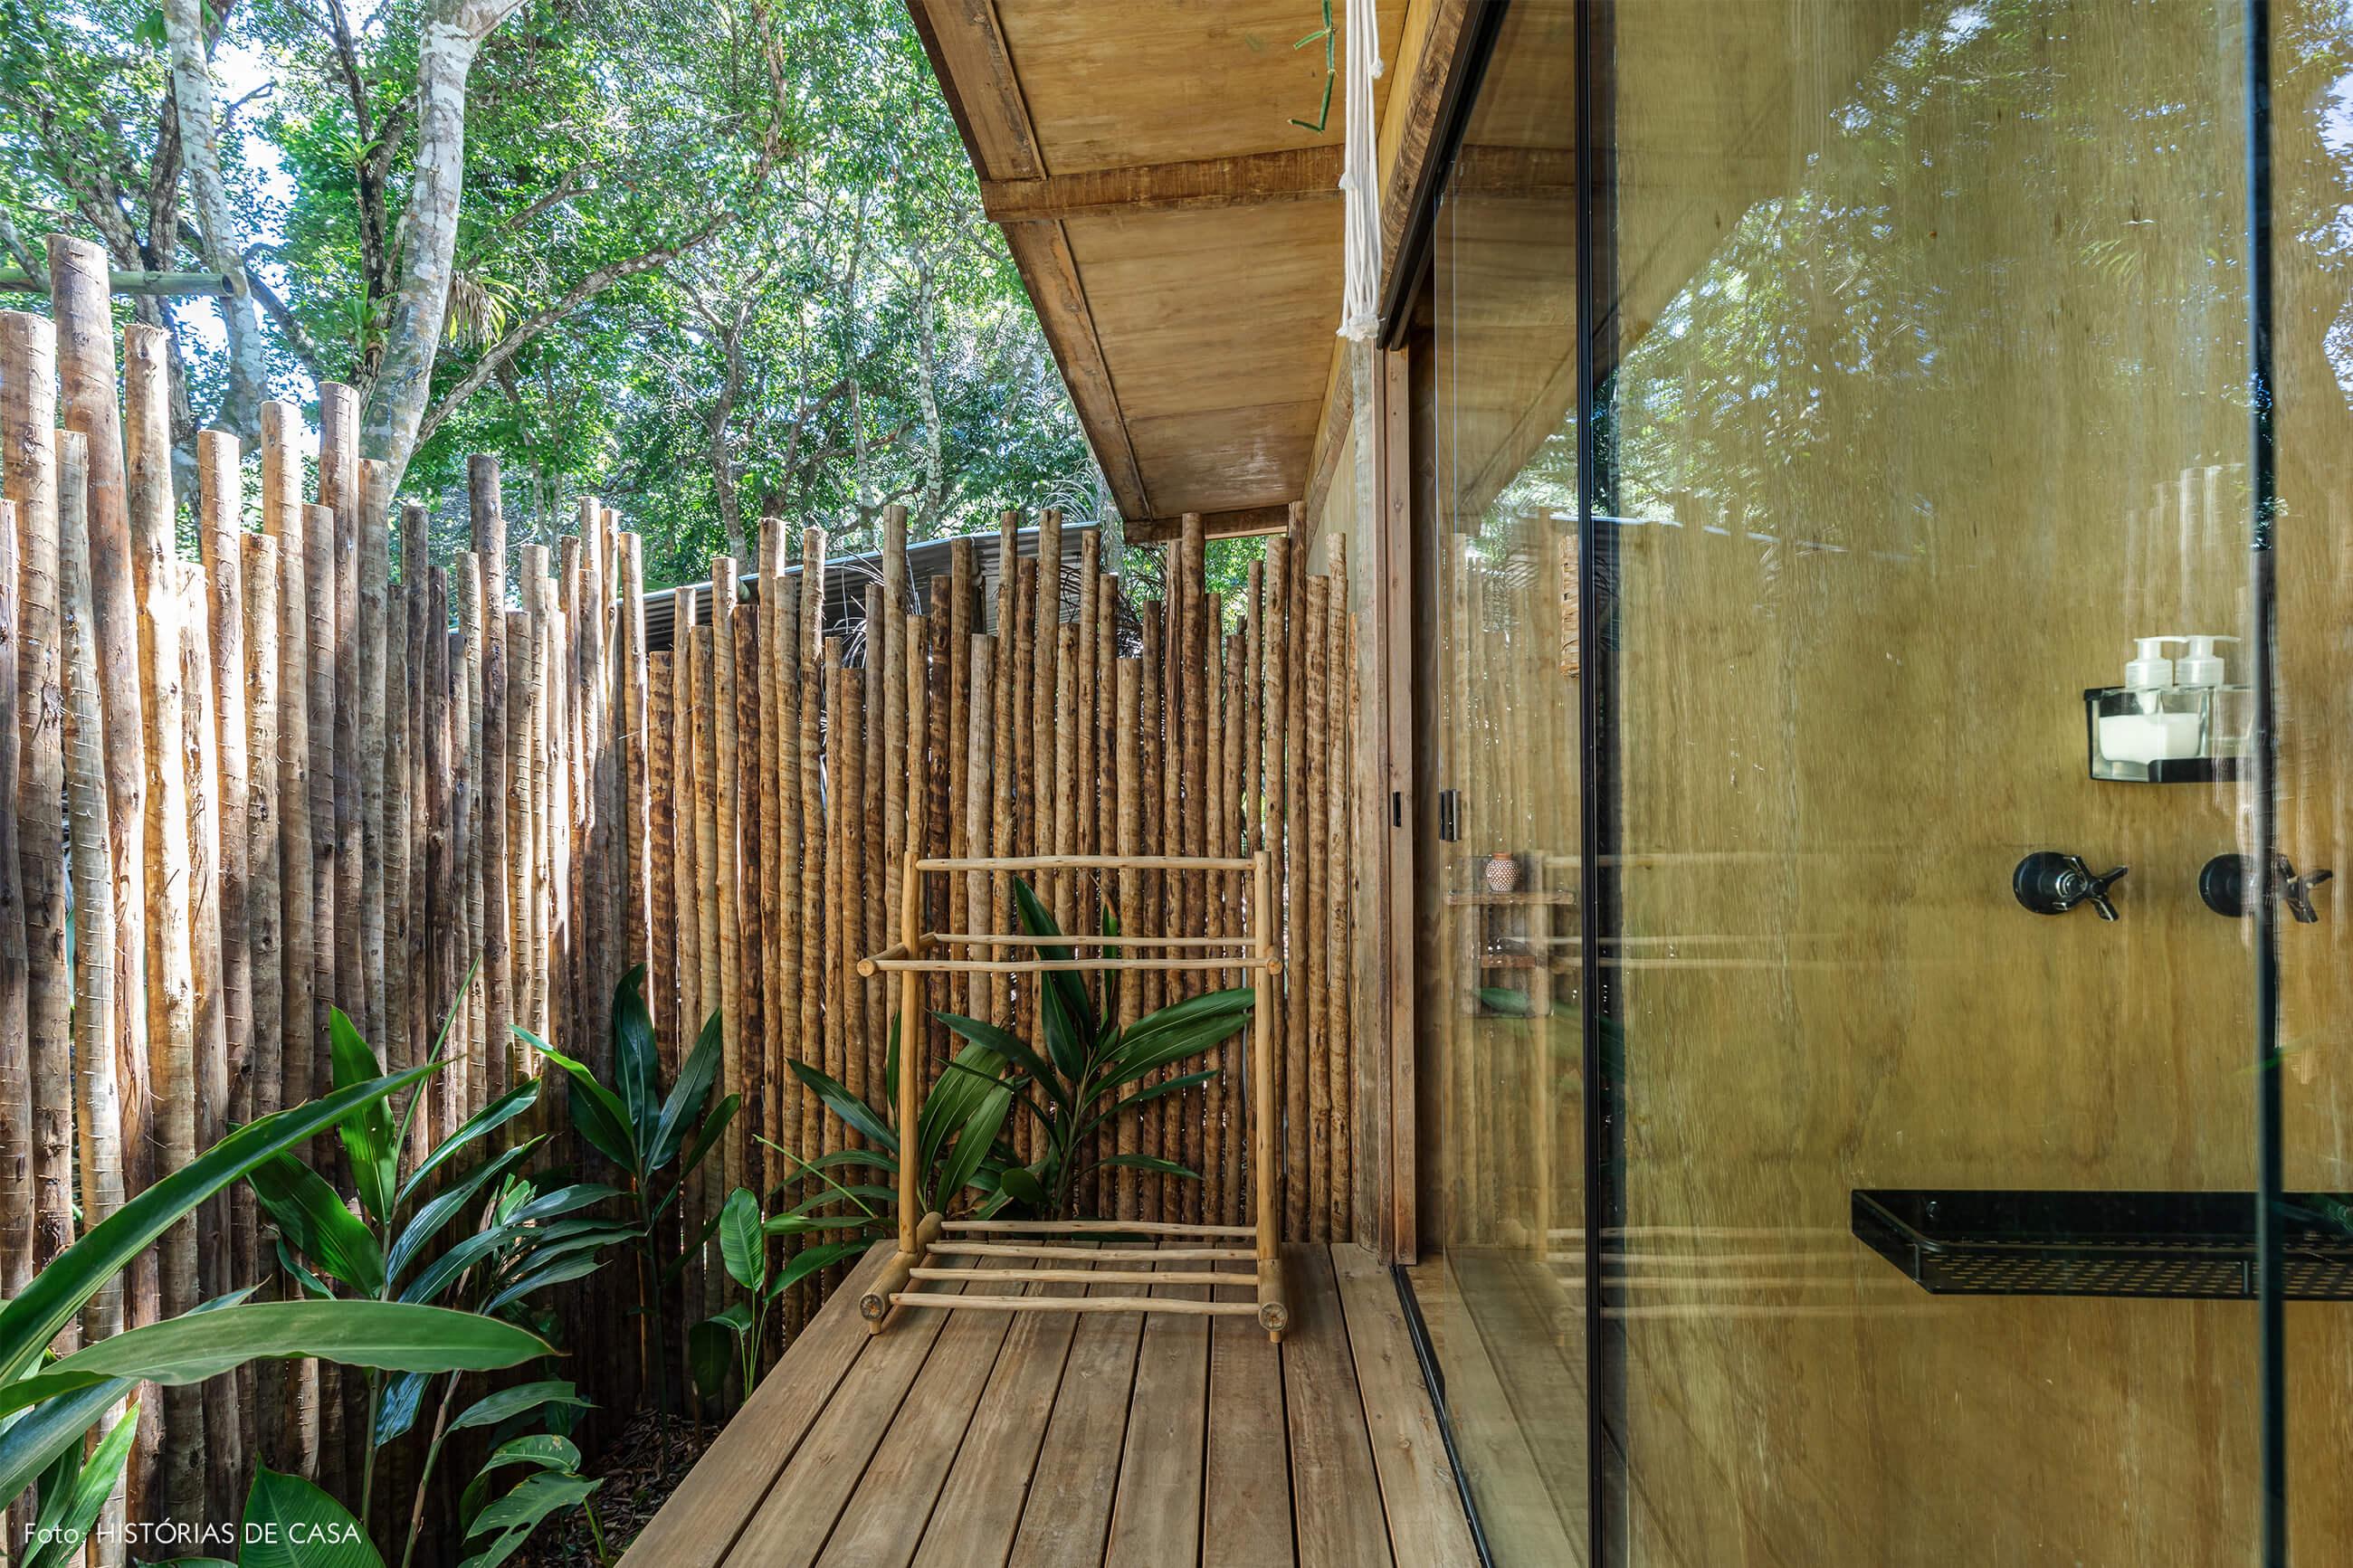 trancoso-decoracao-hotel-villase7e-31-banheiroporta-vidro-muro-bambus-jardim